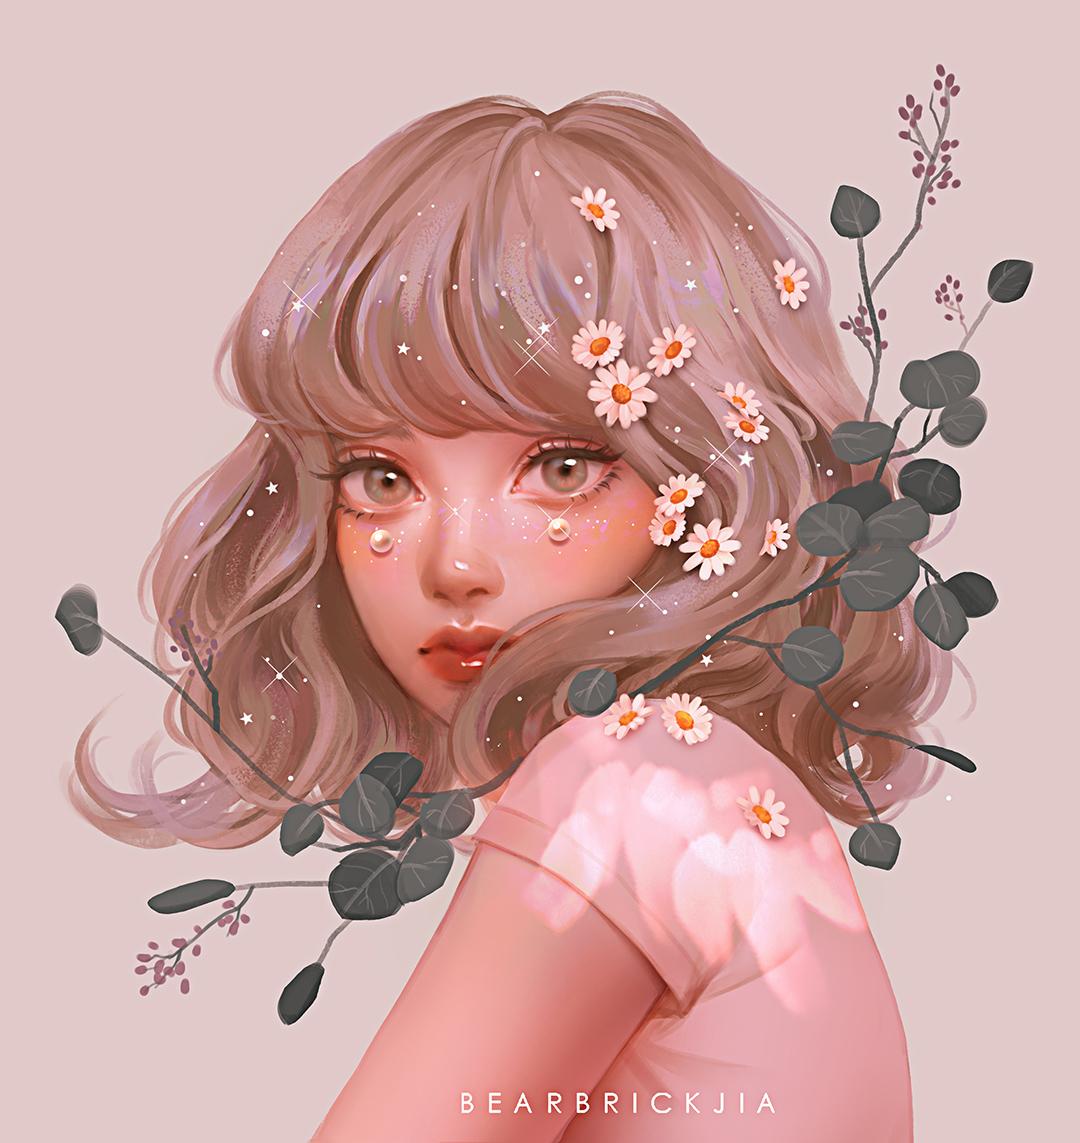 GirlsclubAsia-Artist-Illustrator-Karmen Loh-DaisyDrops